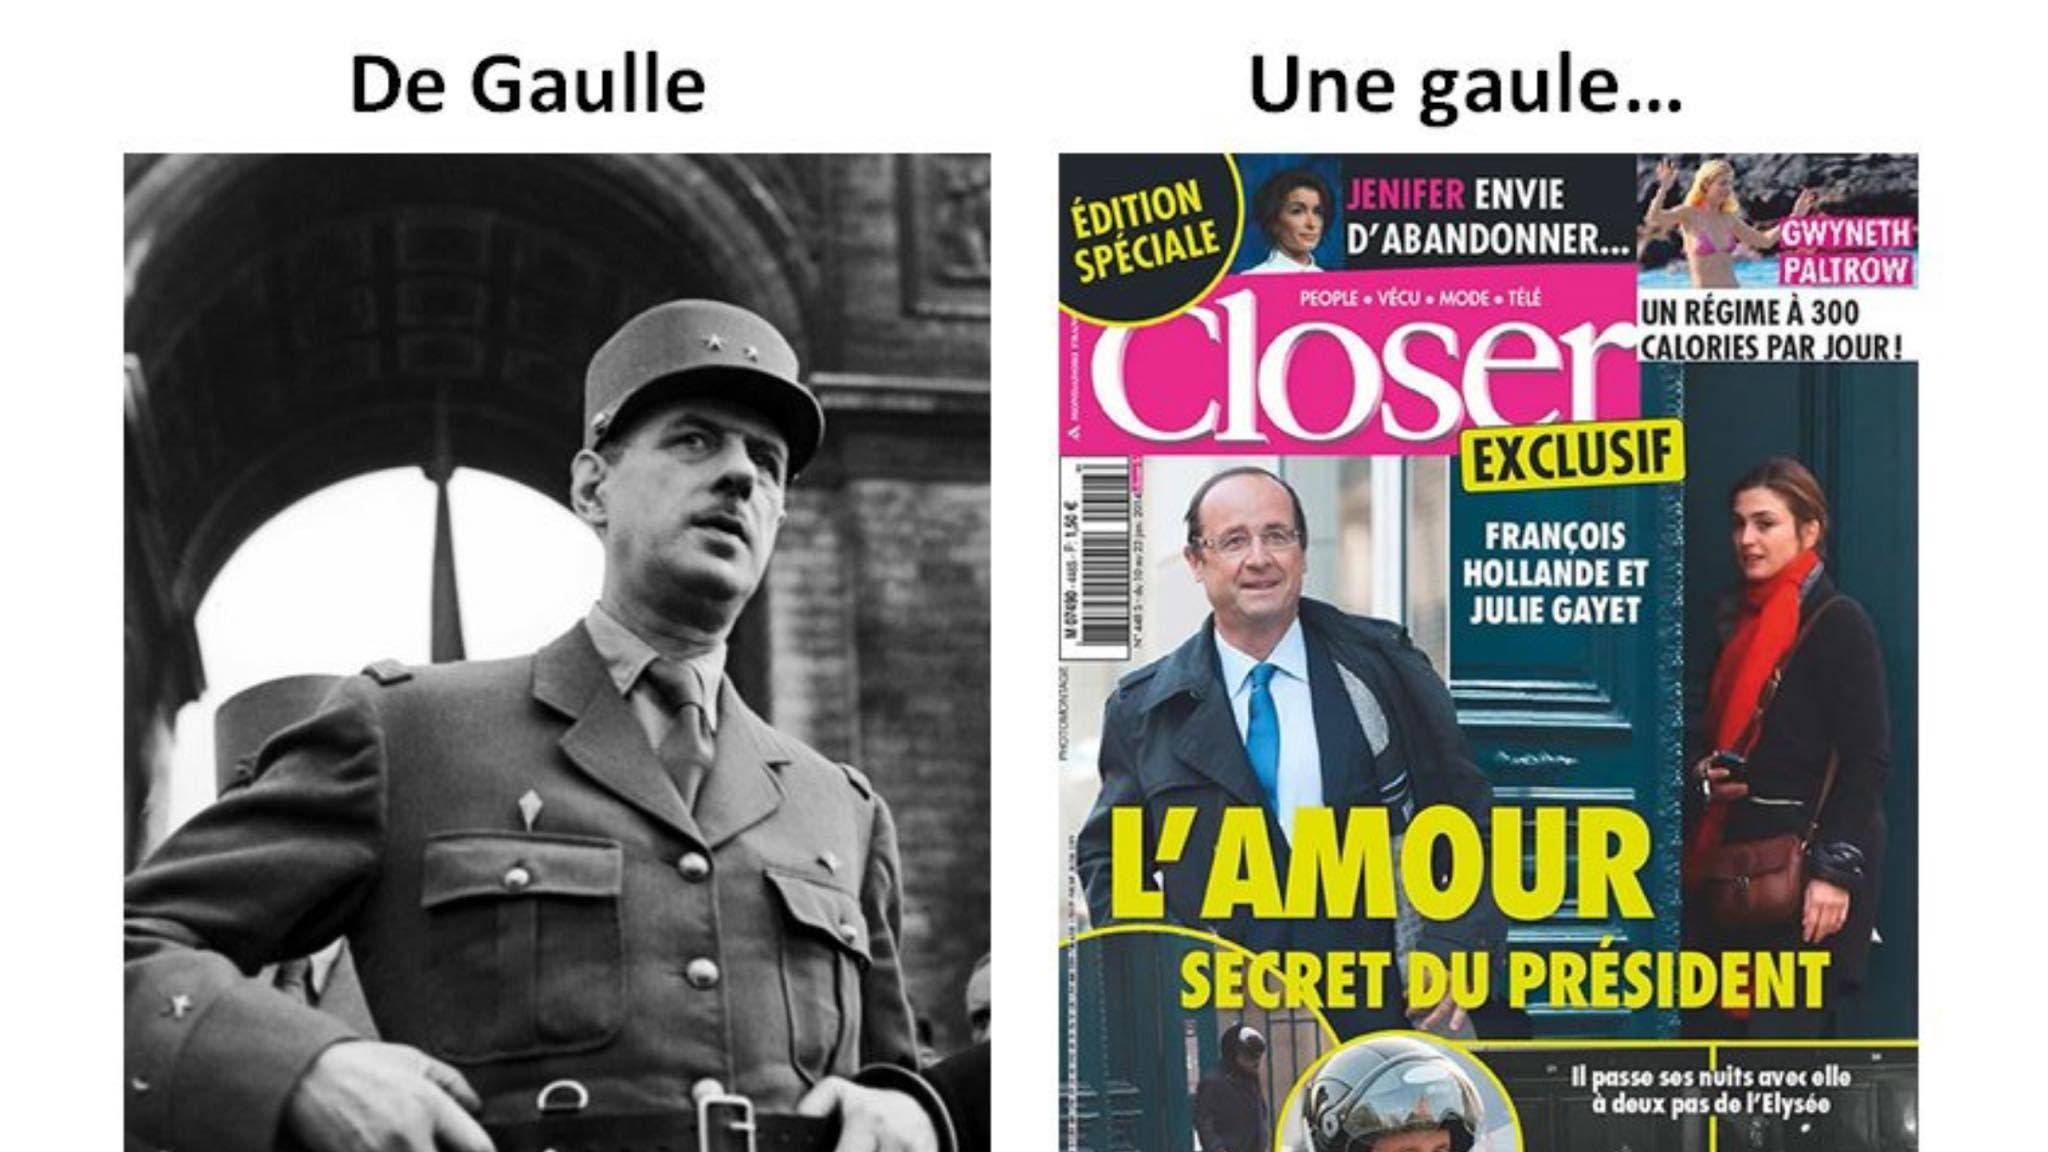 de-gaulle-une-gaulle